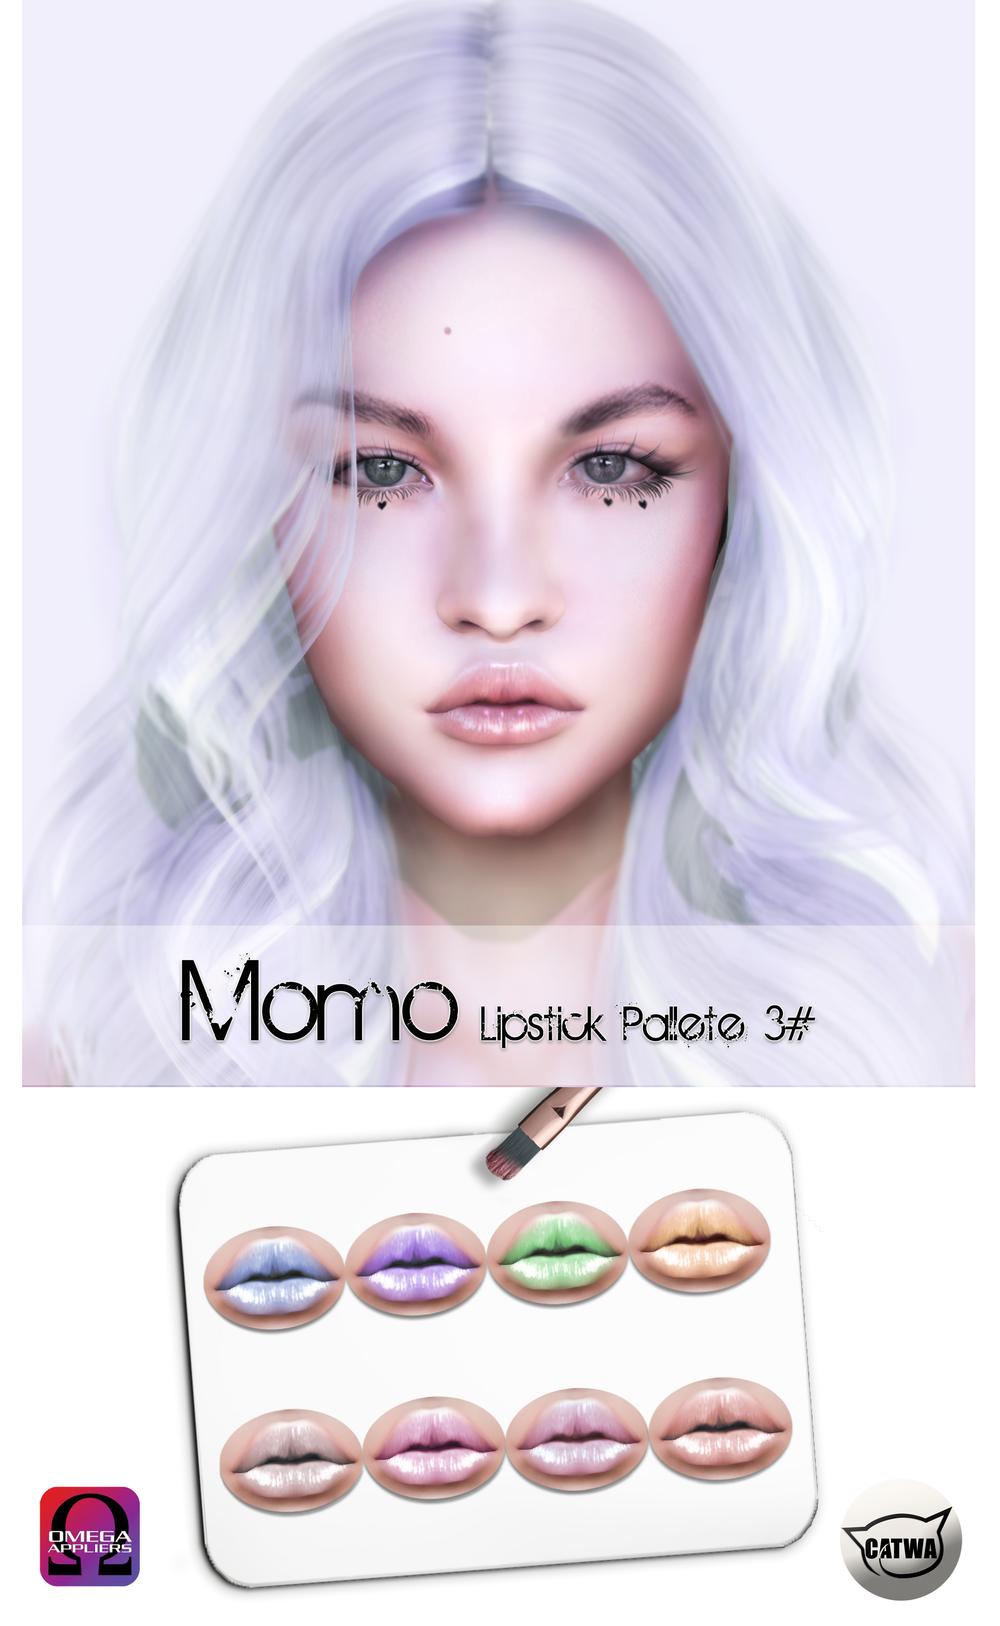 Momo Lipstick Pallete 3# .png